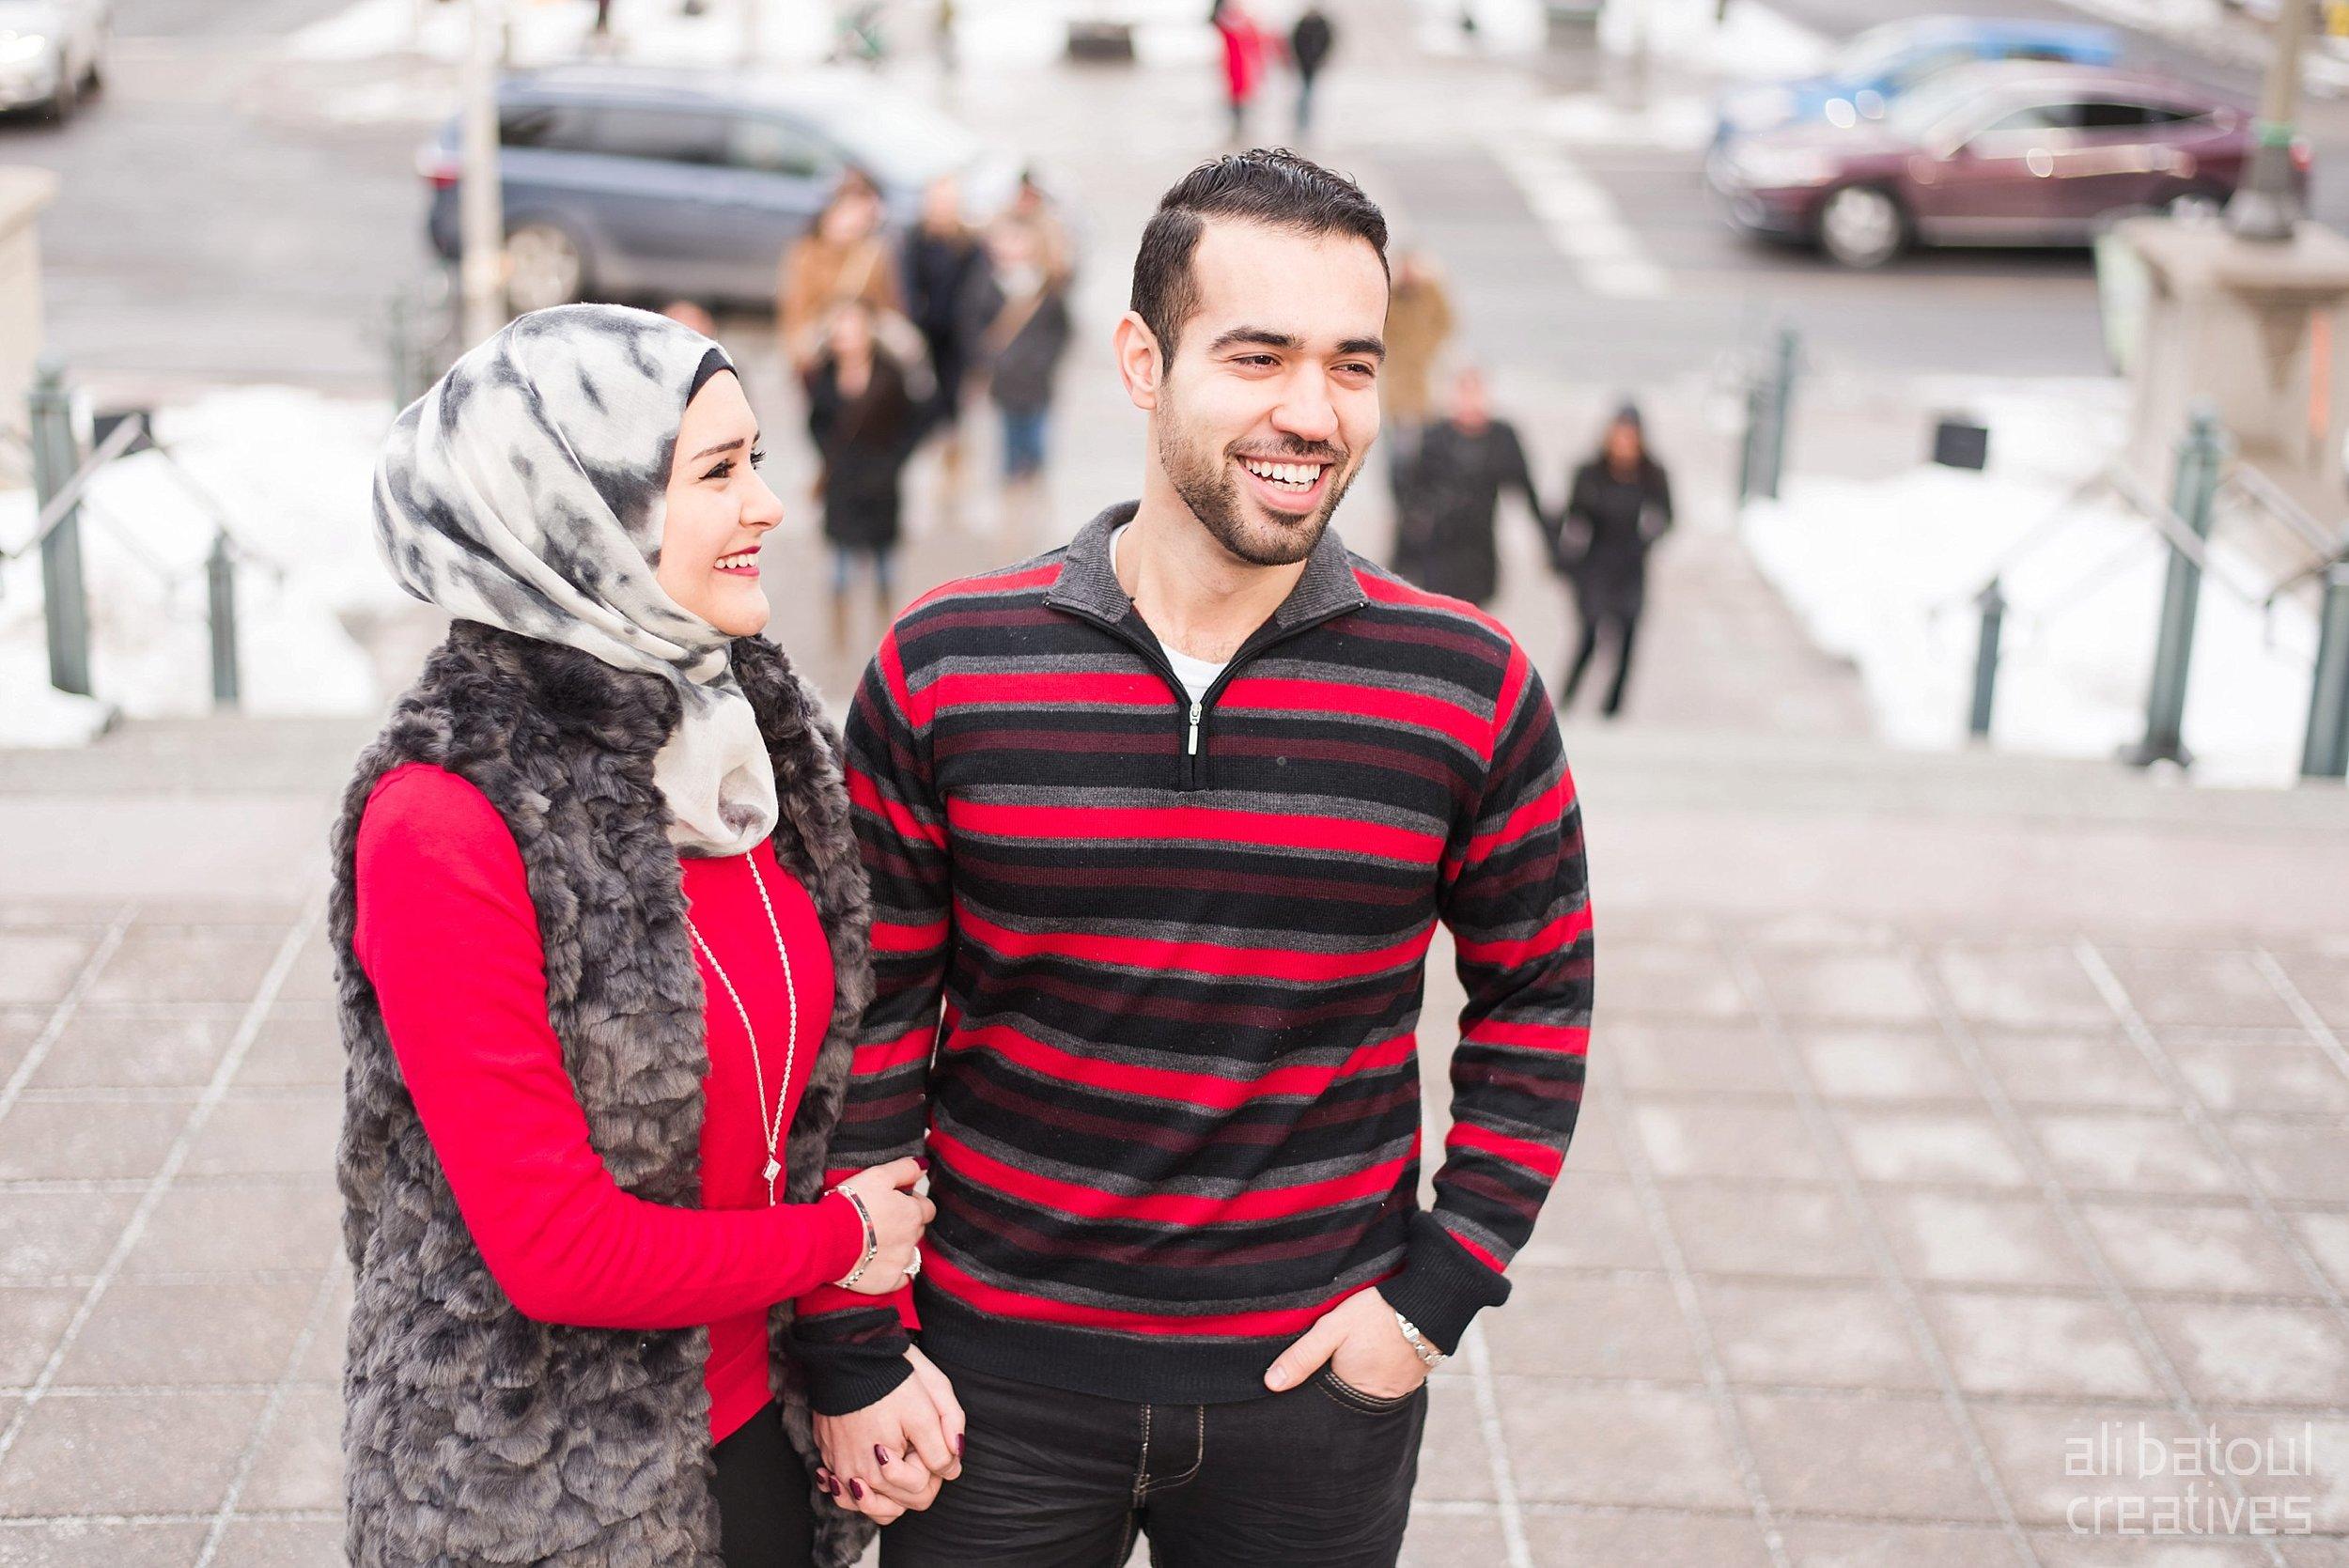 Hanan + Said Engagement - Ali Batoul Creatives Photography_00003.jpg